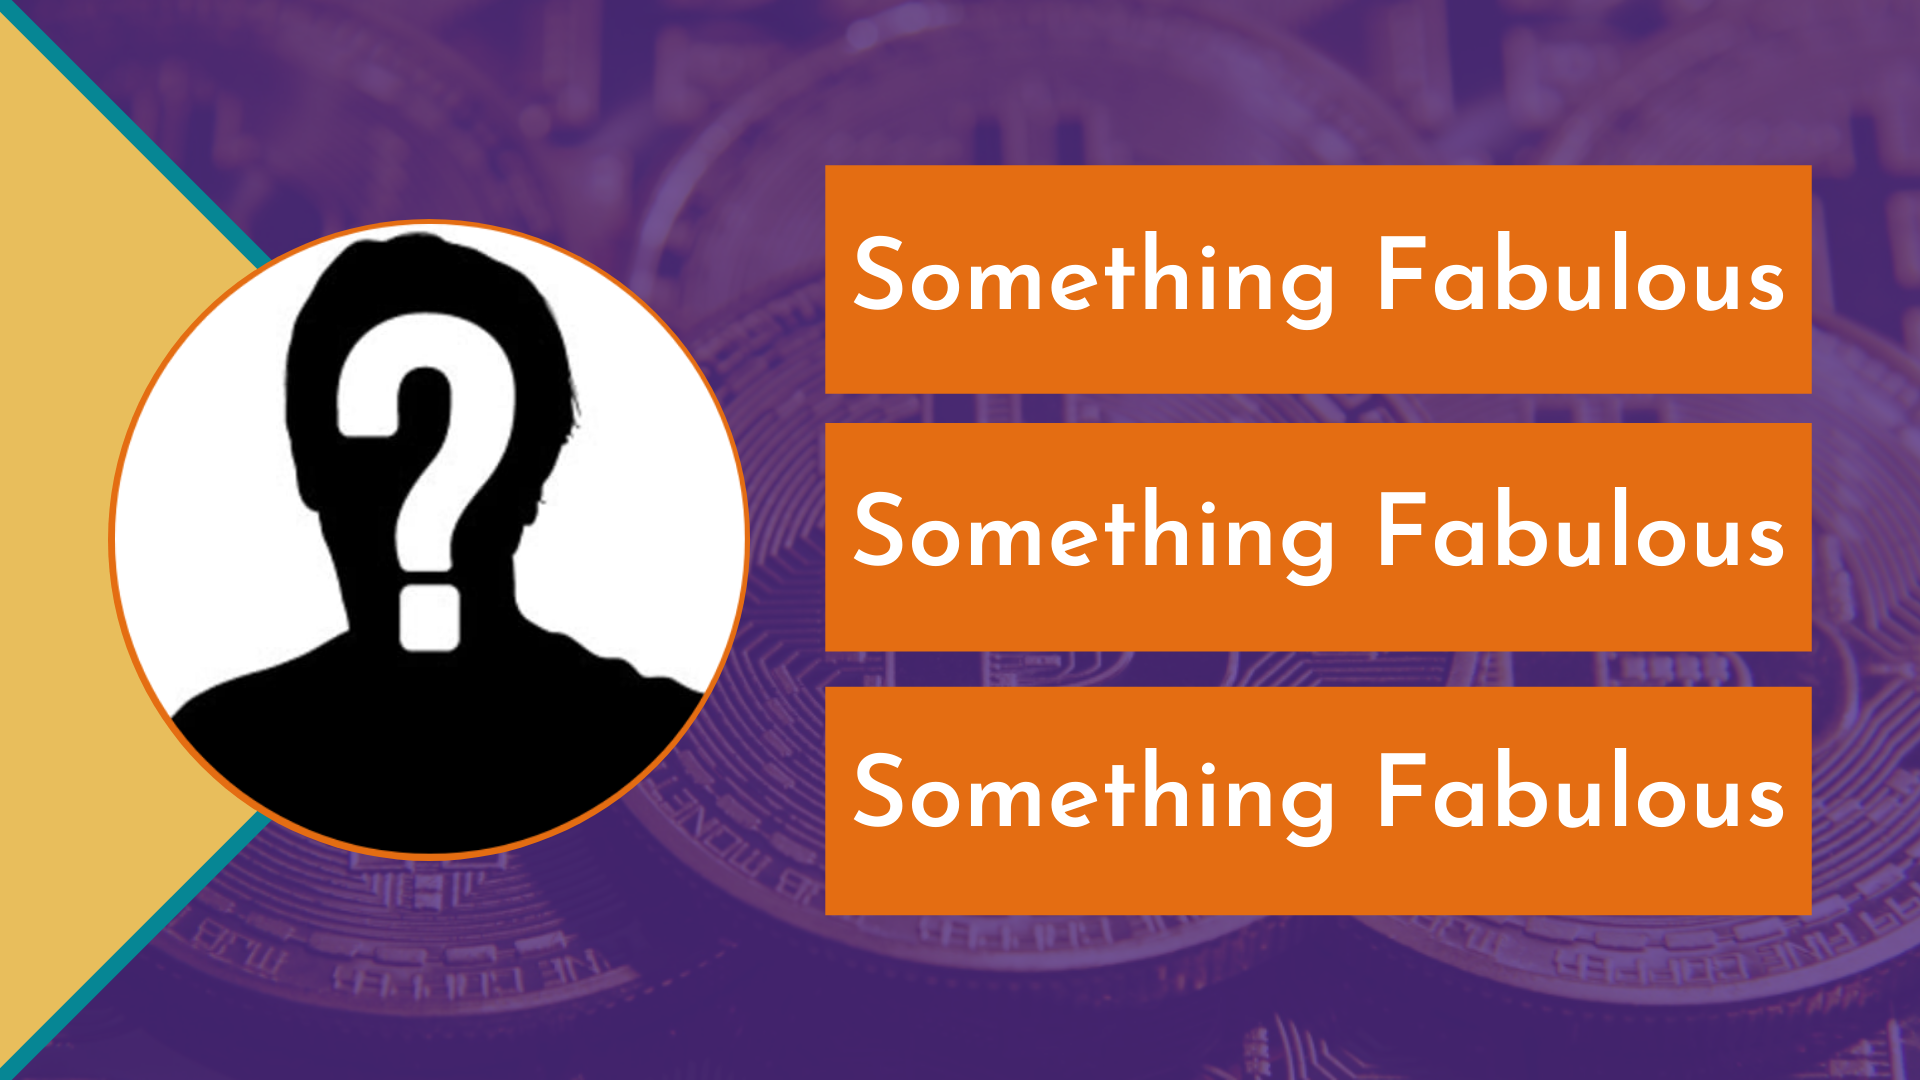 MMCrypto,Chris,Crypto Forum, Cryptocurrency Forum